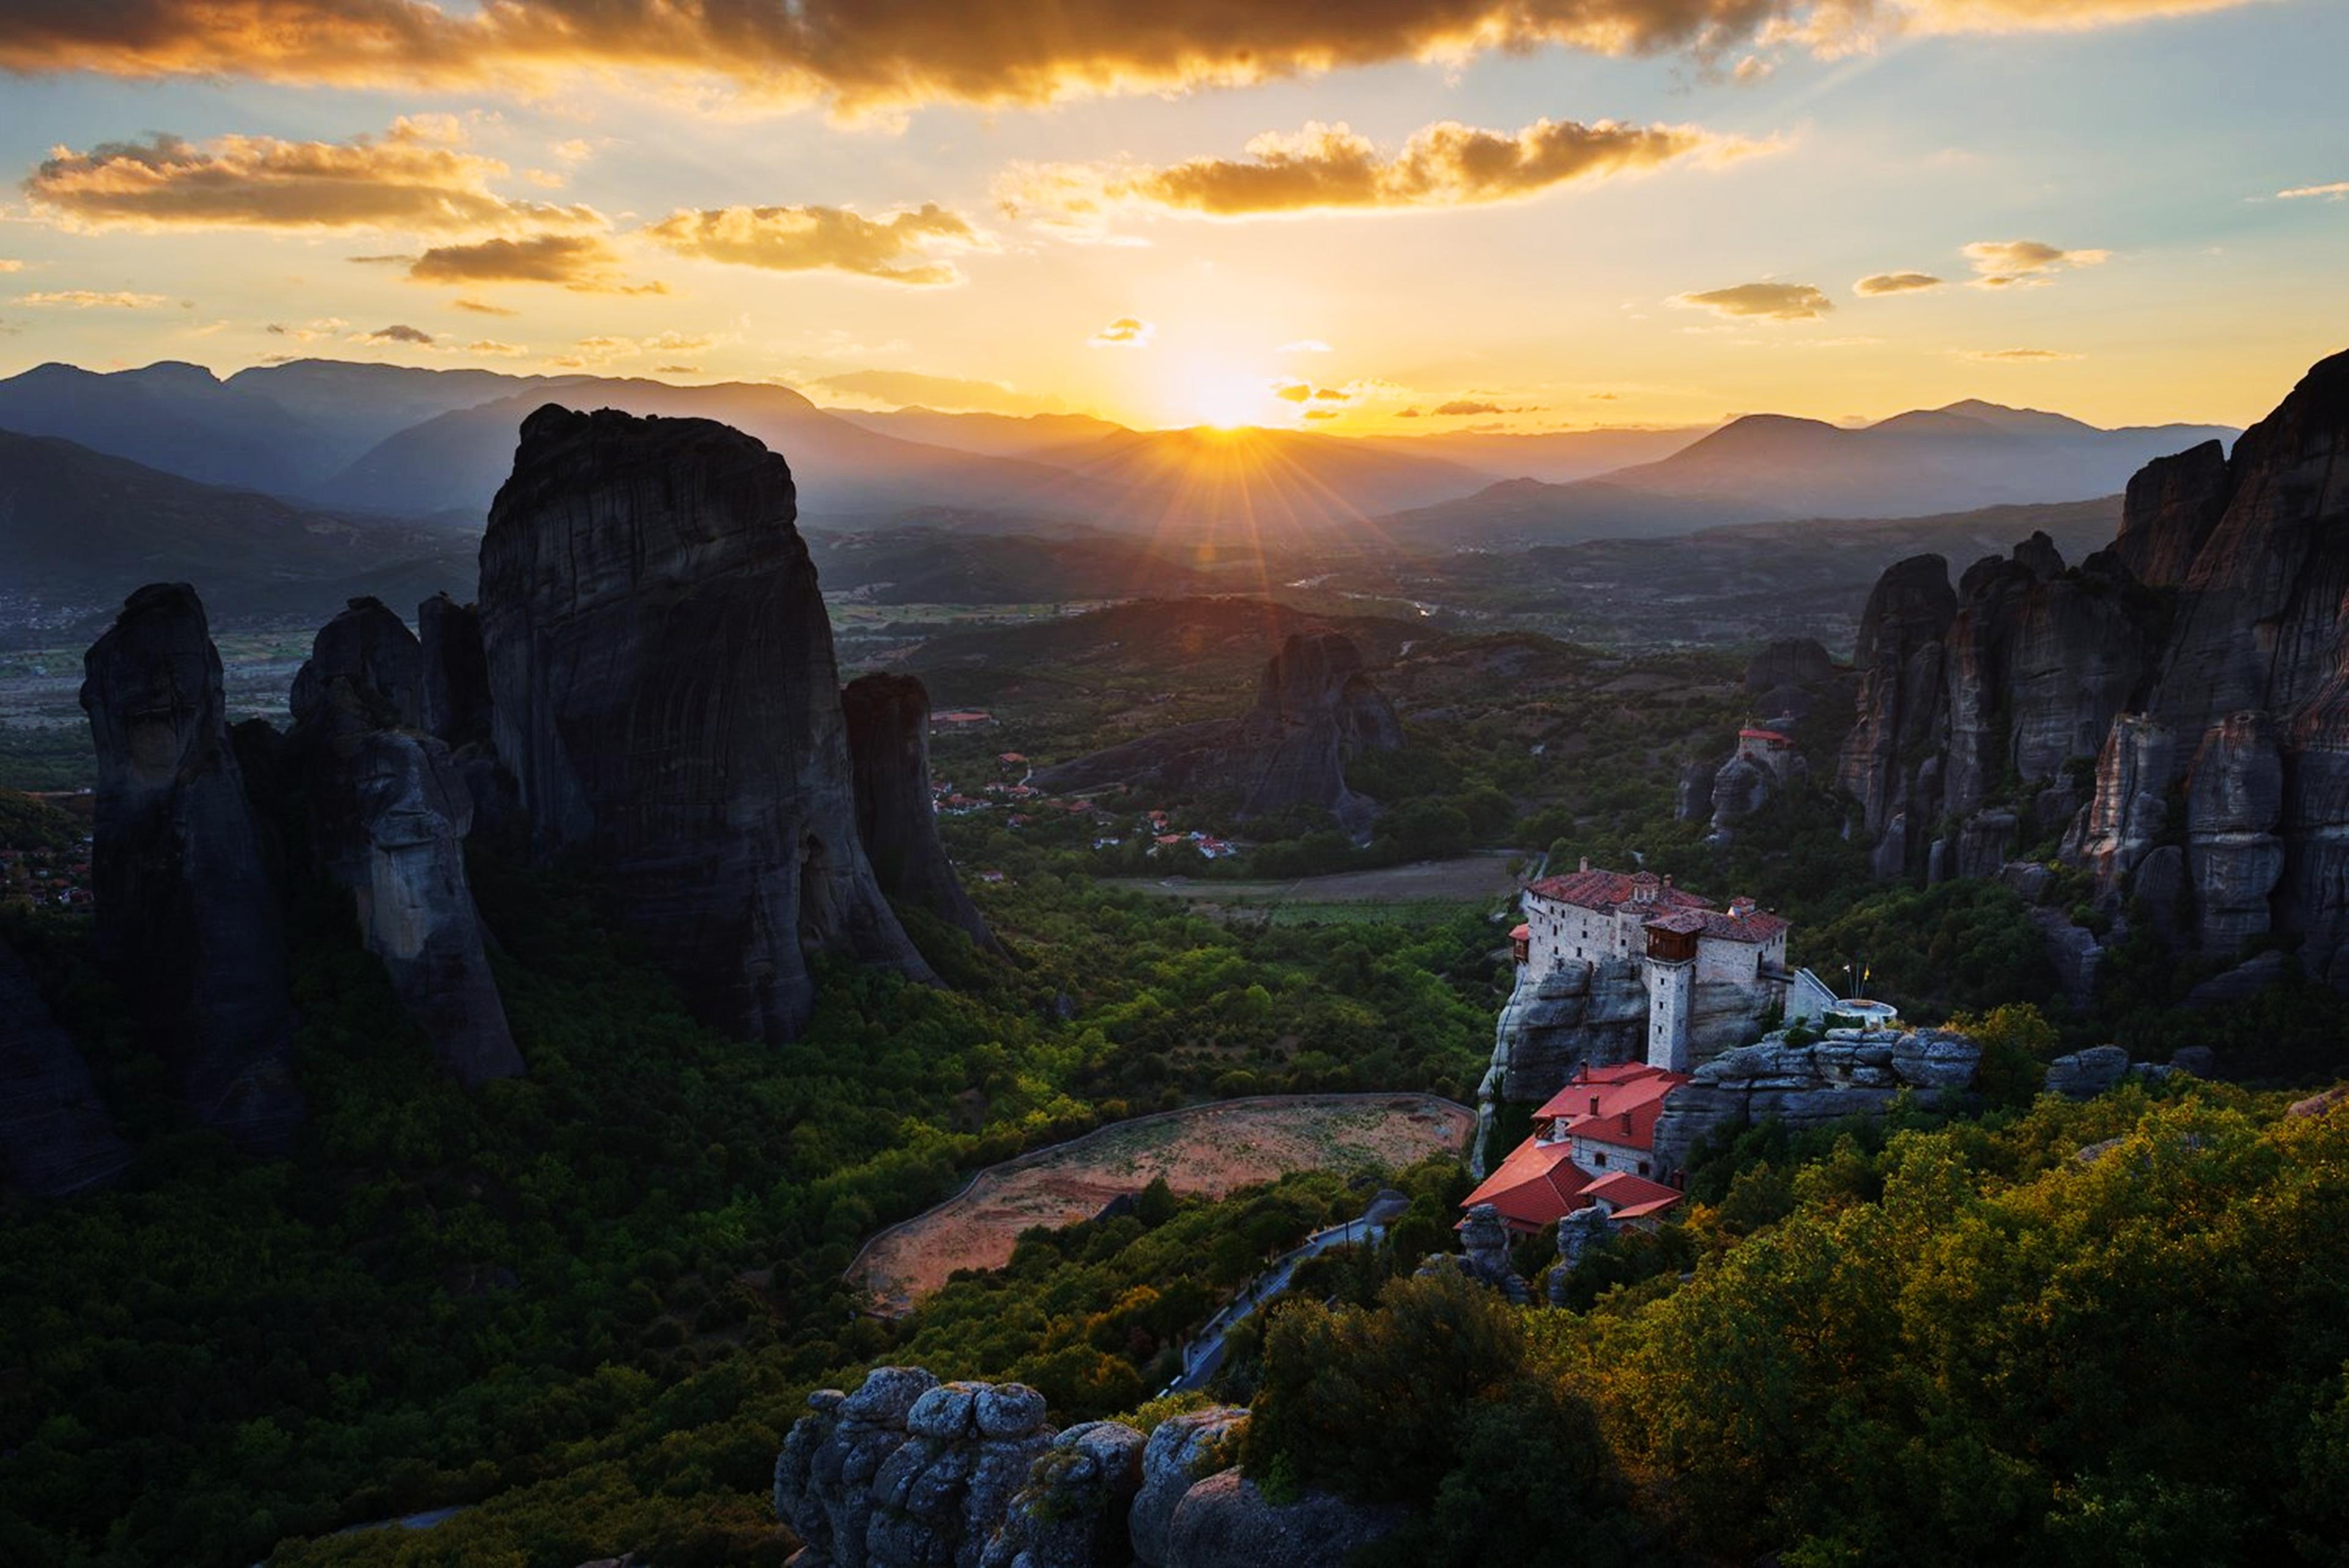 Greece 4k Ultra Fond d'écran HD   Arrière-Plan   3840x2563   ID:598779 - Wallpaper Abyss